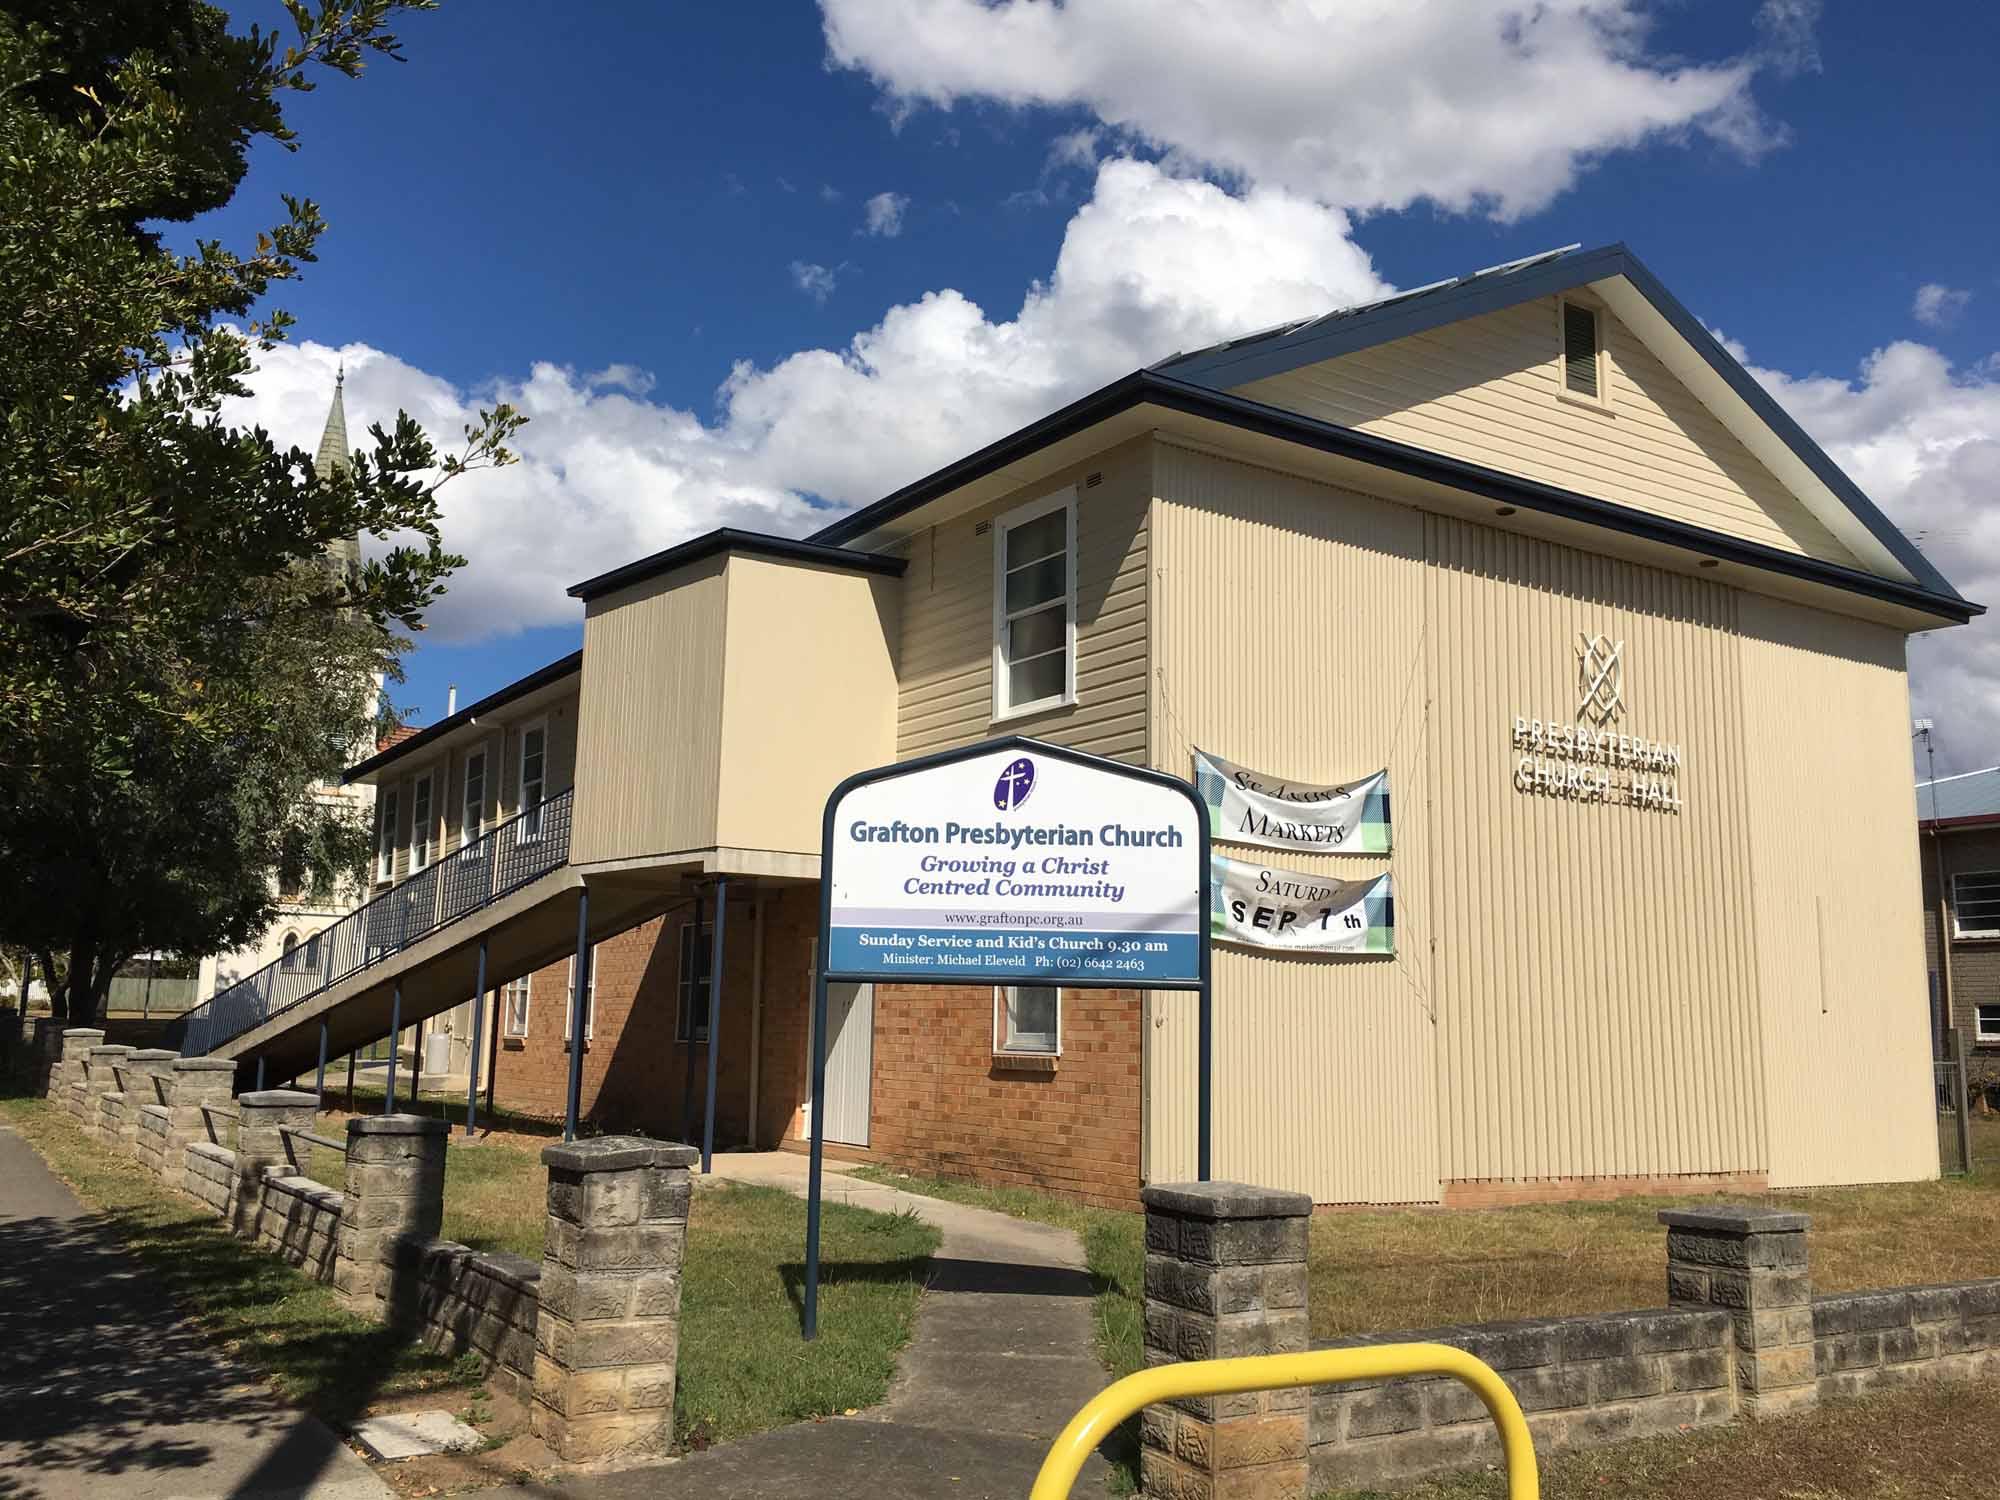 Presbyterian Church Grafton Painting Project